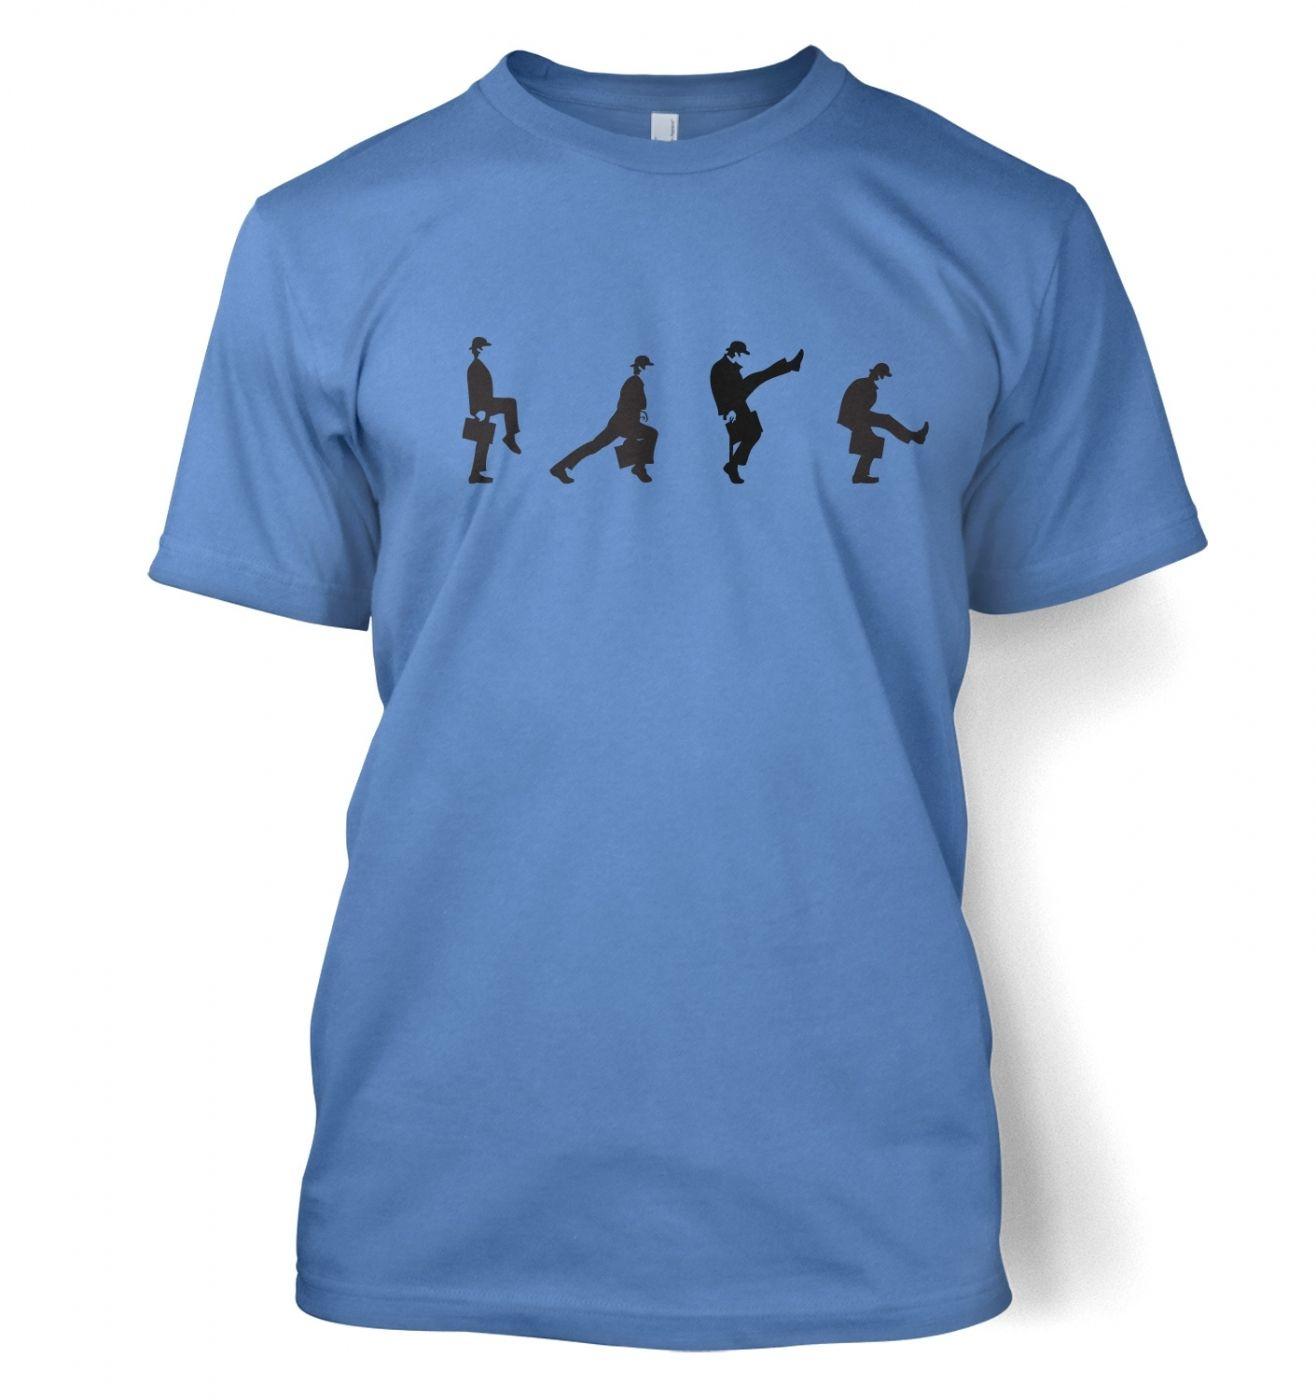 Row Of Silly Walks men's t-shirt